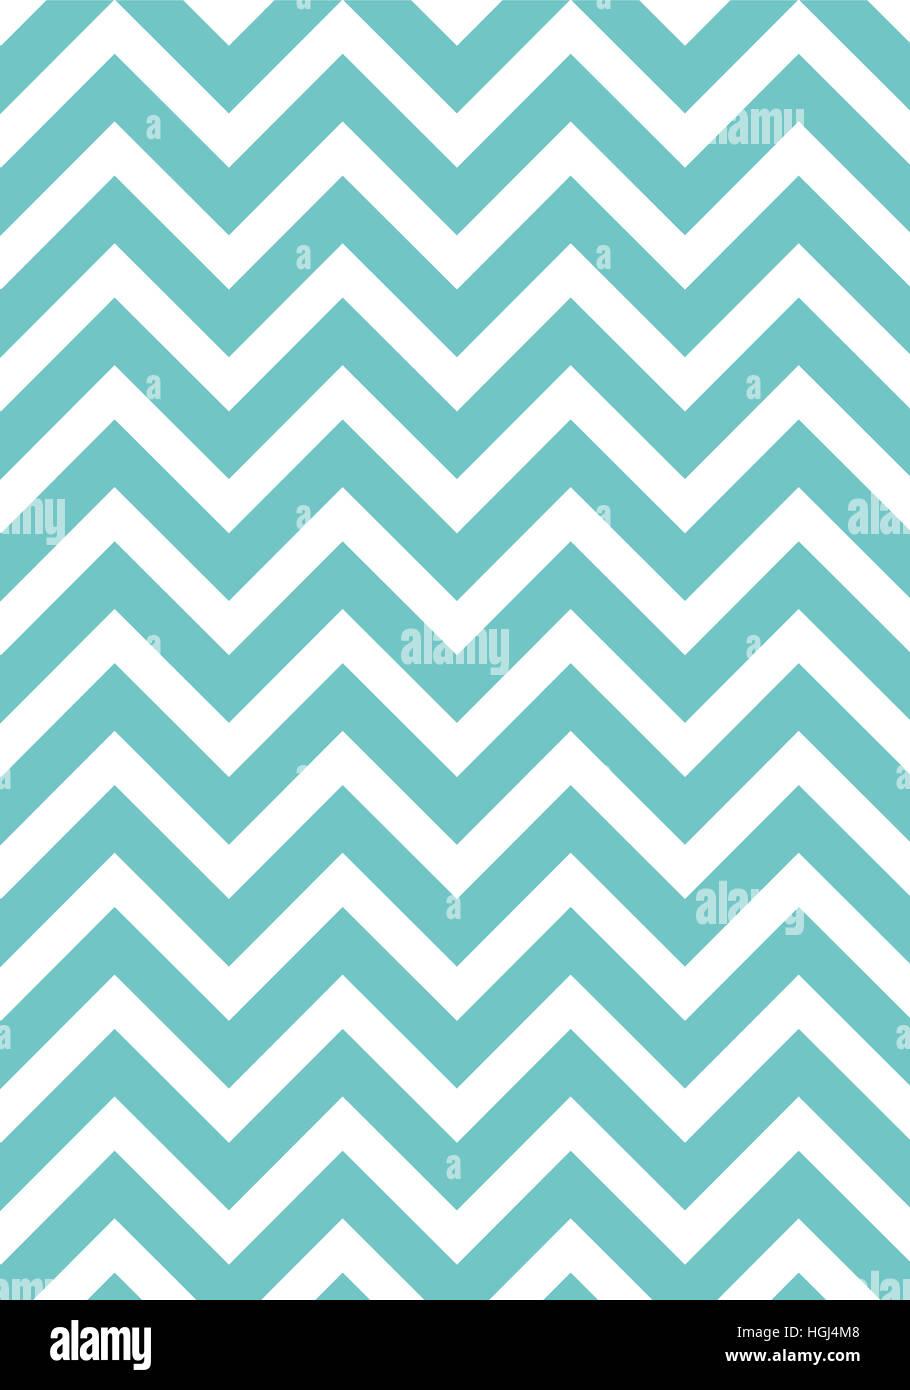 Zigzag pattern lightblue wallpaper - Stock Image